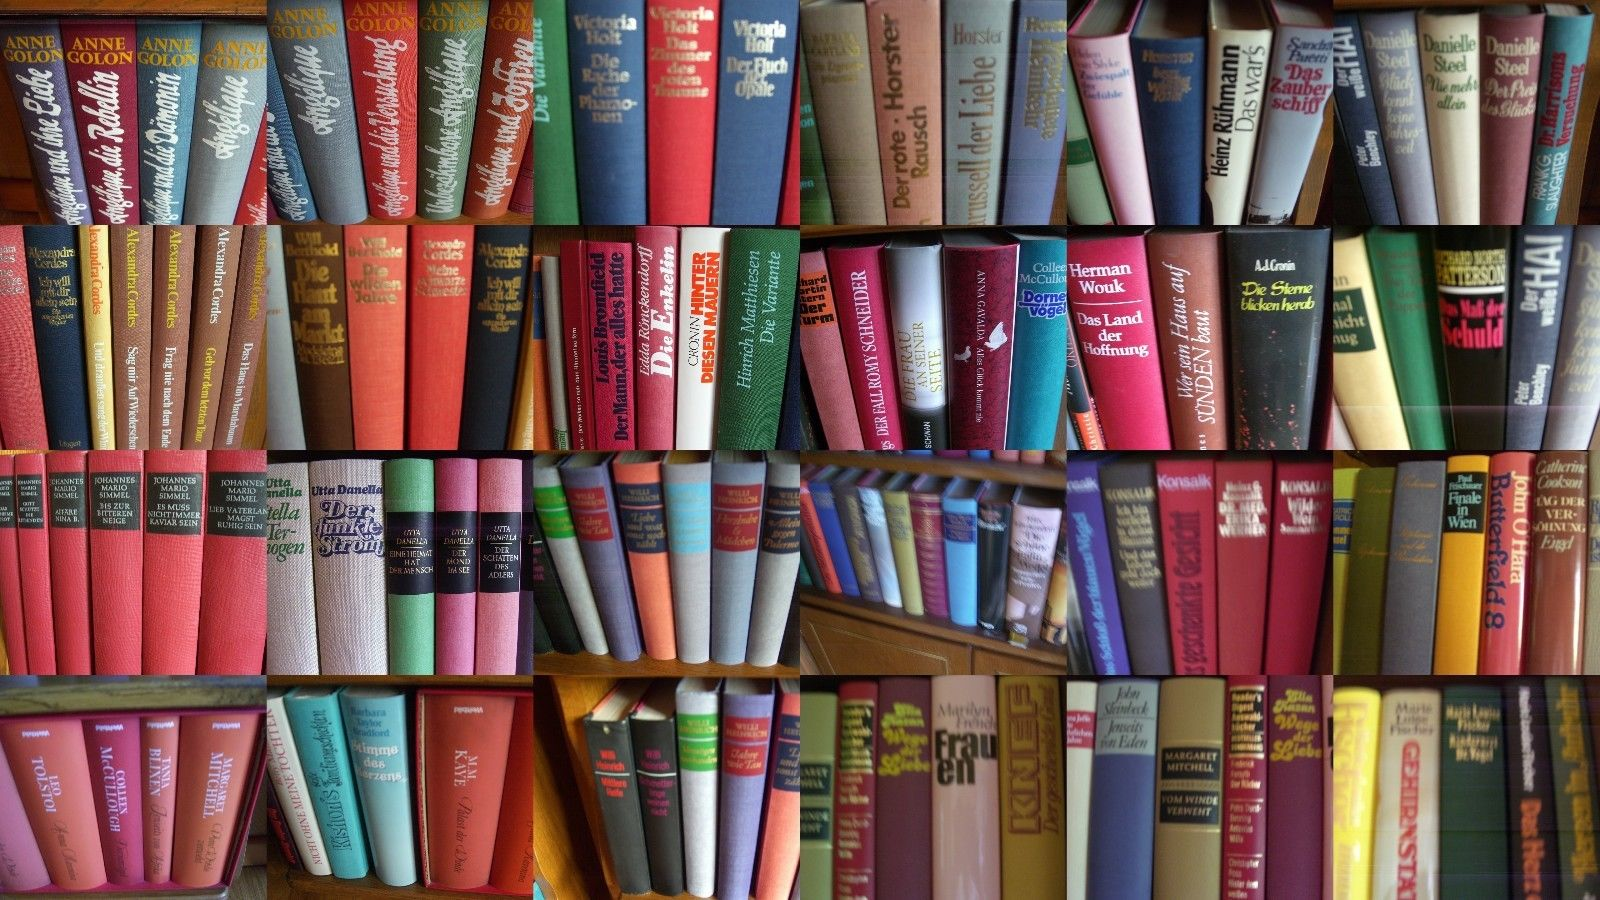 riesiges Konvolut ca. 400 geb. Bücher, u.a. Frauenliteratur, Romane, Klassiker